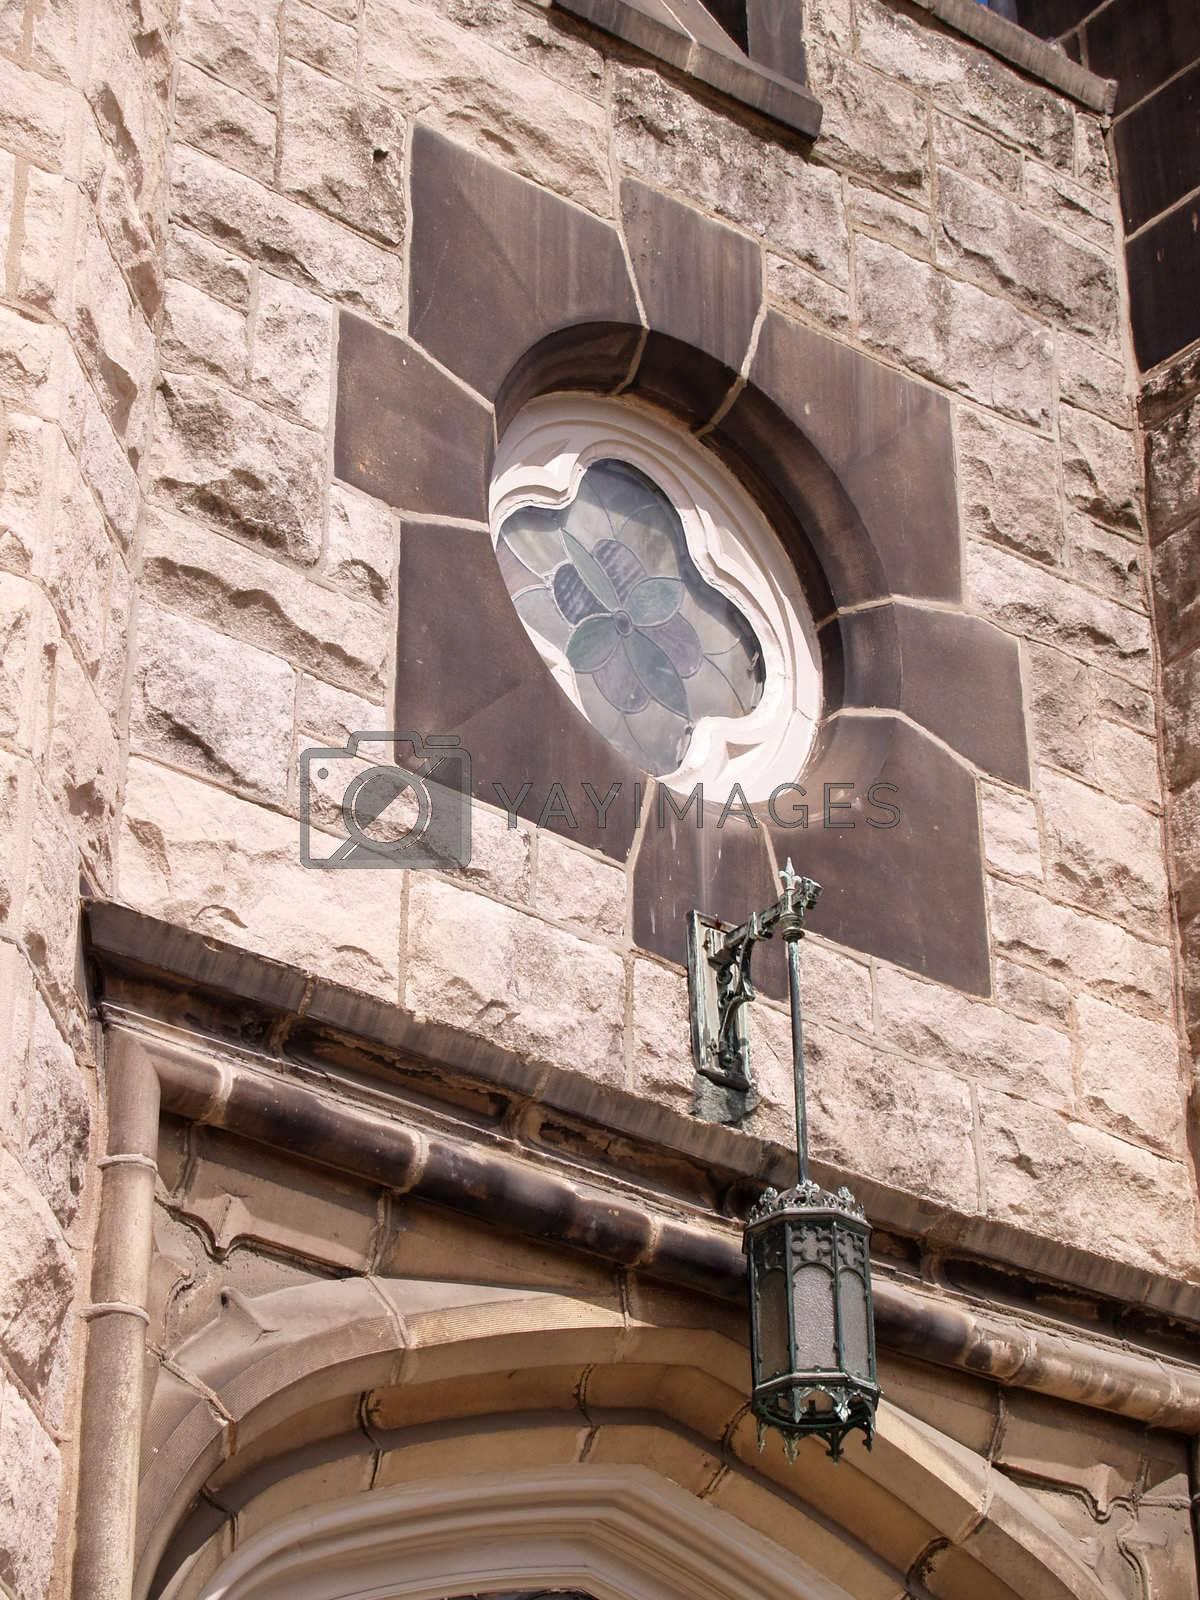 window on an old stone church